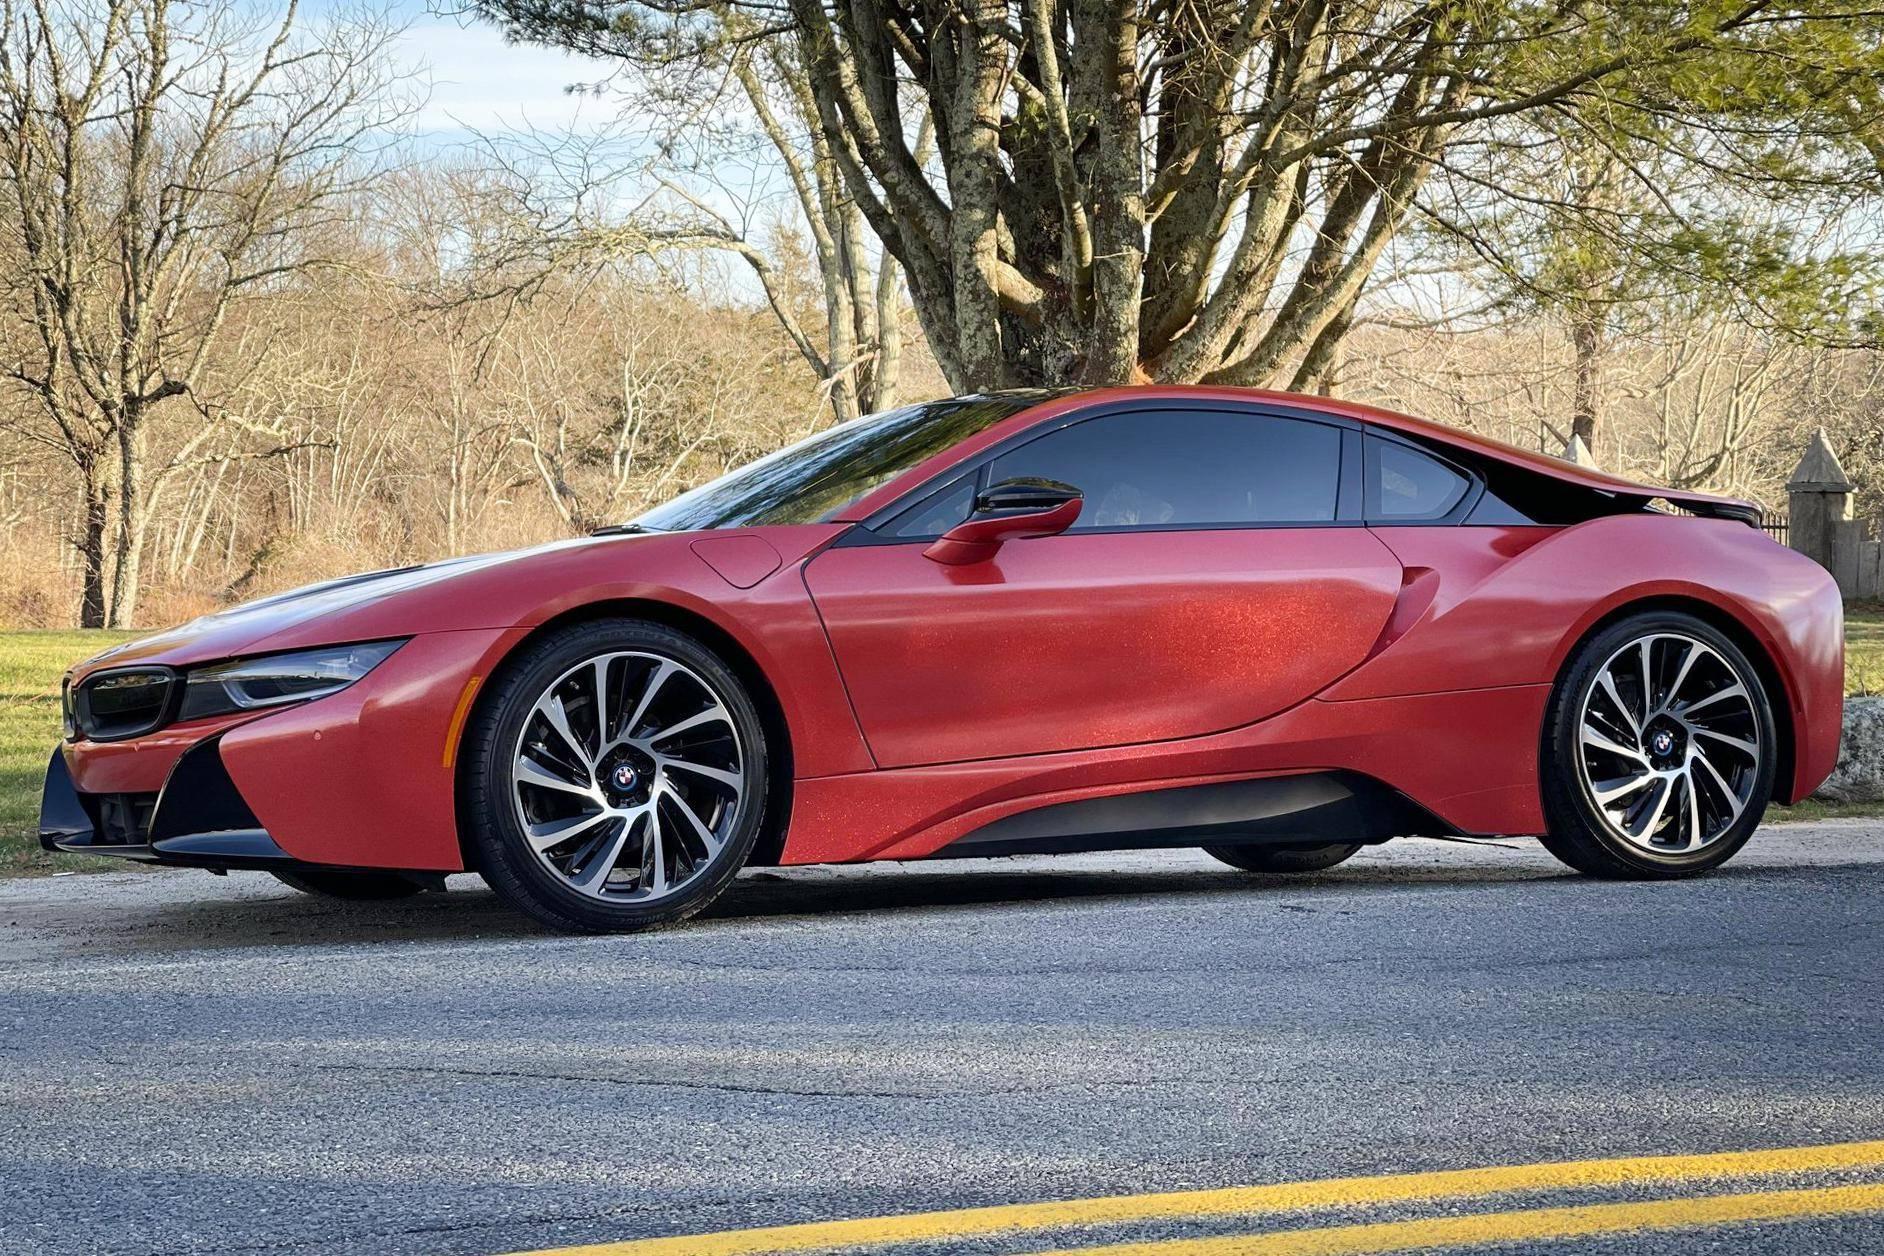 2015 Bmw I8 Auction Cars Bids